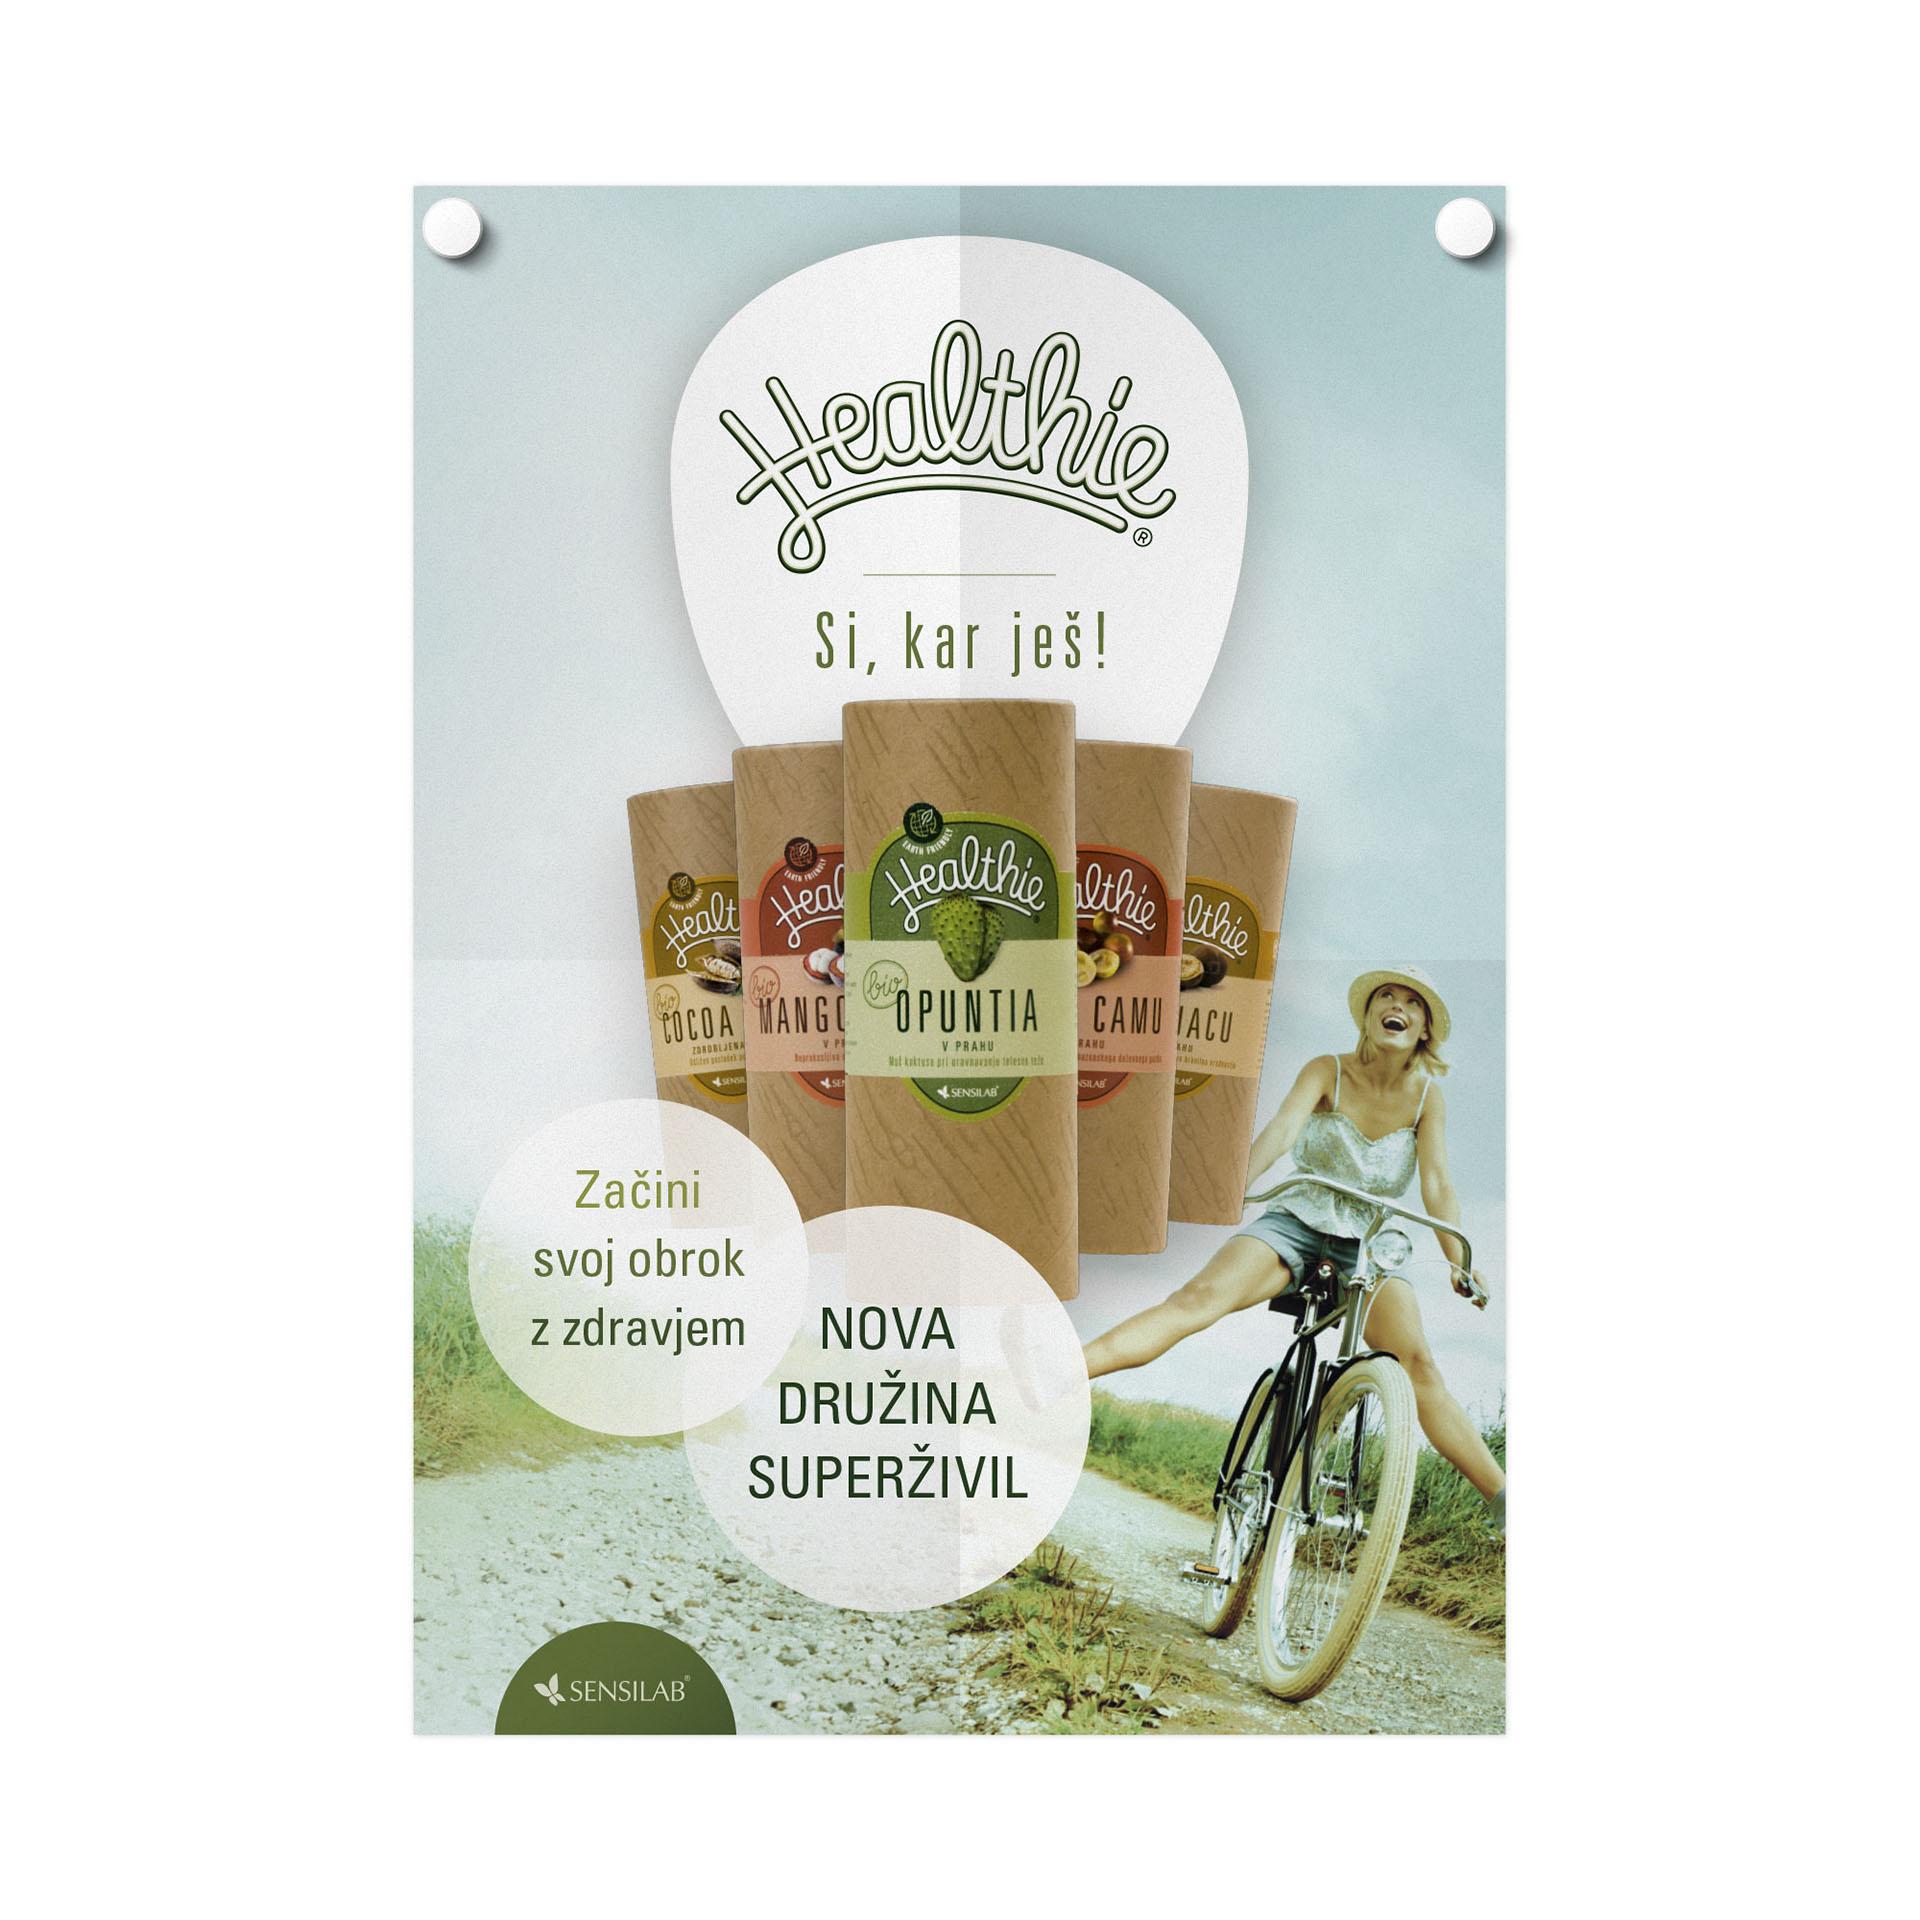 arnoldvuga-sensilab-healthie-jure-kozuh-07